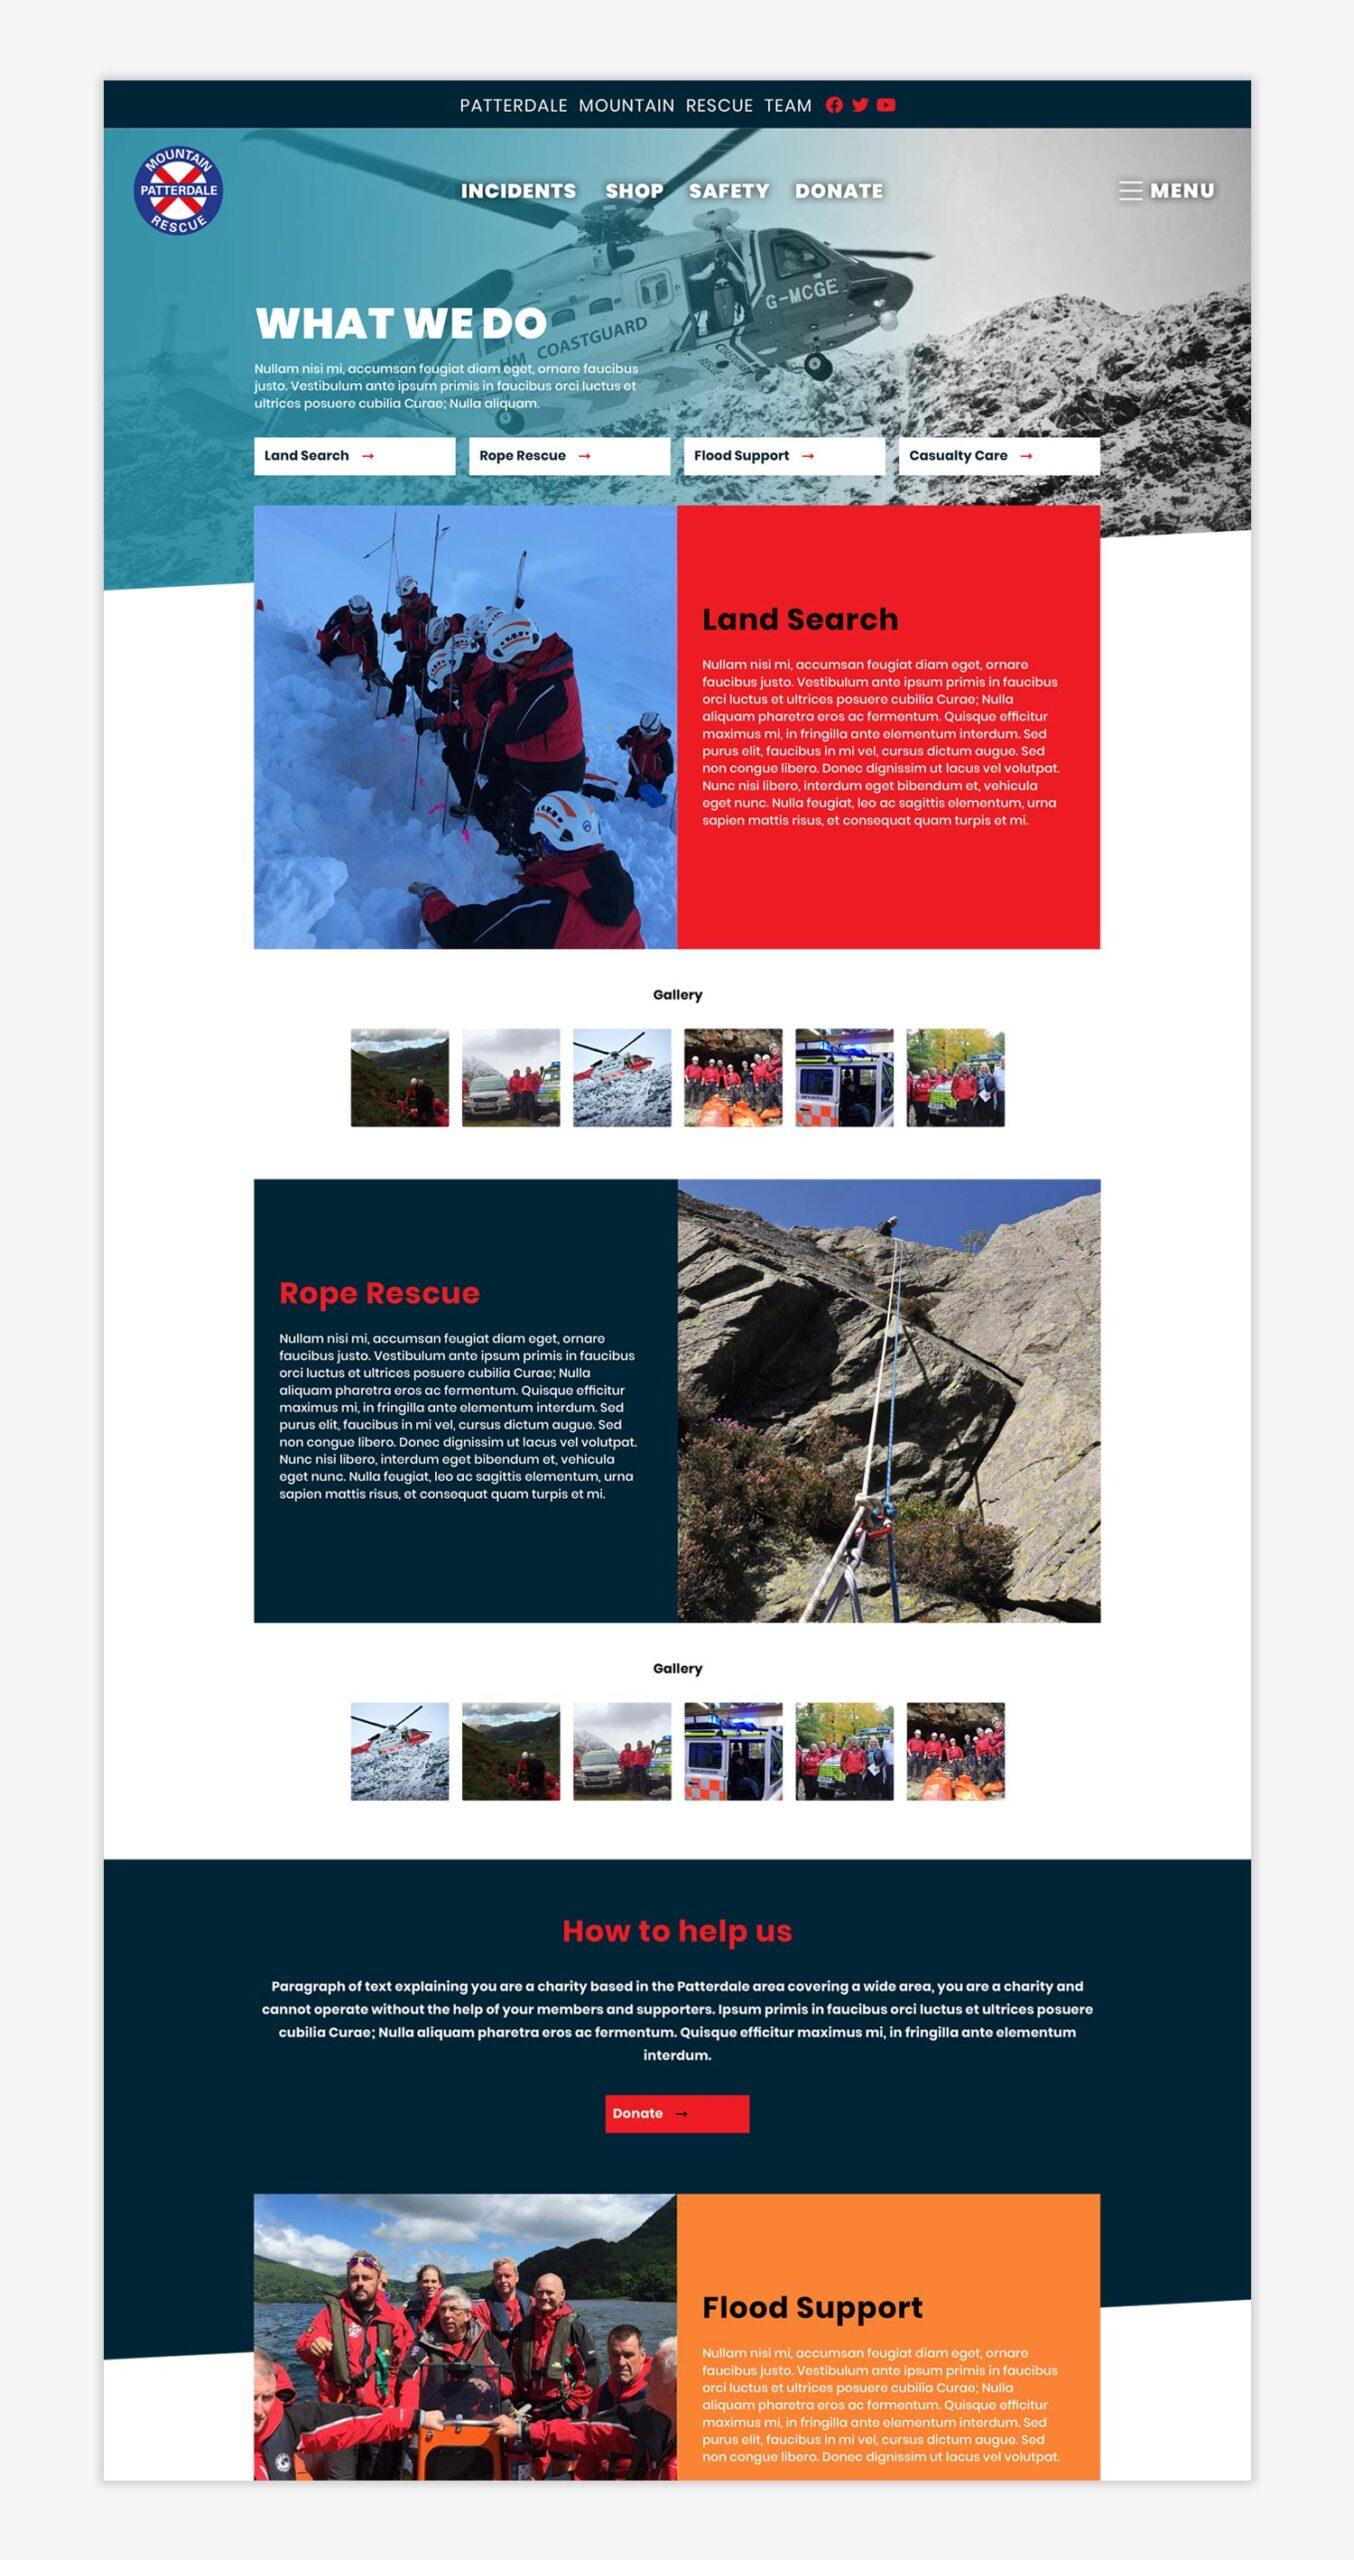 PMRT-half-page-web4